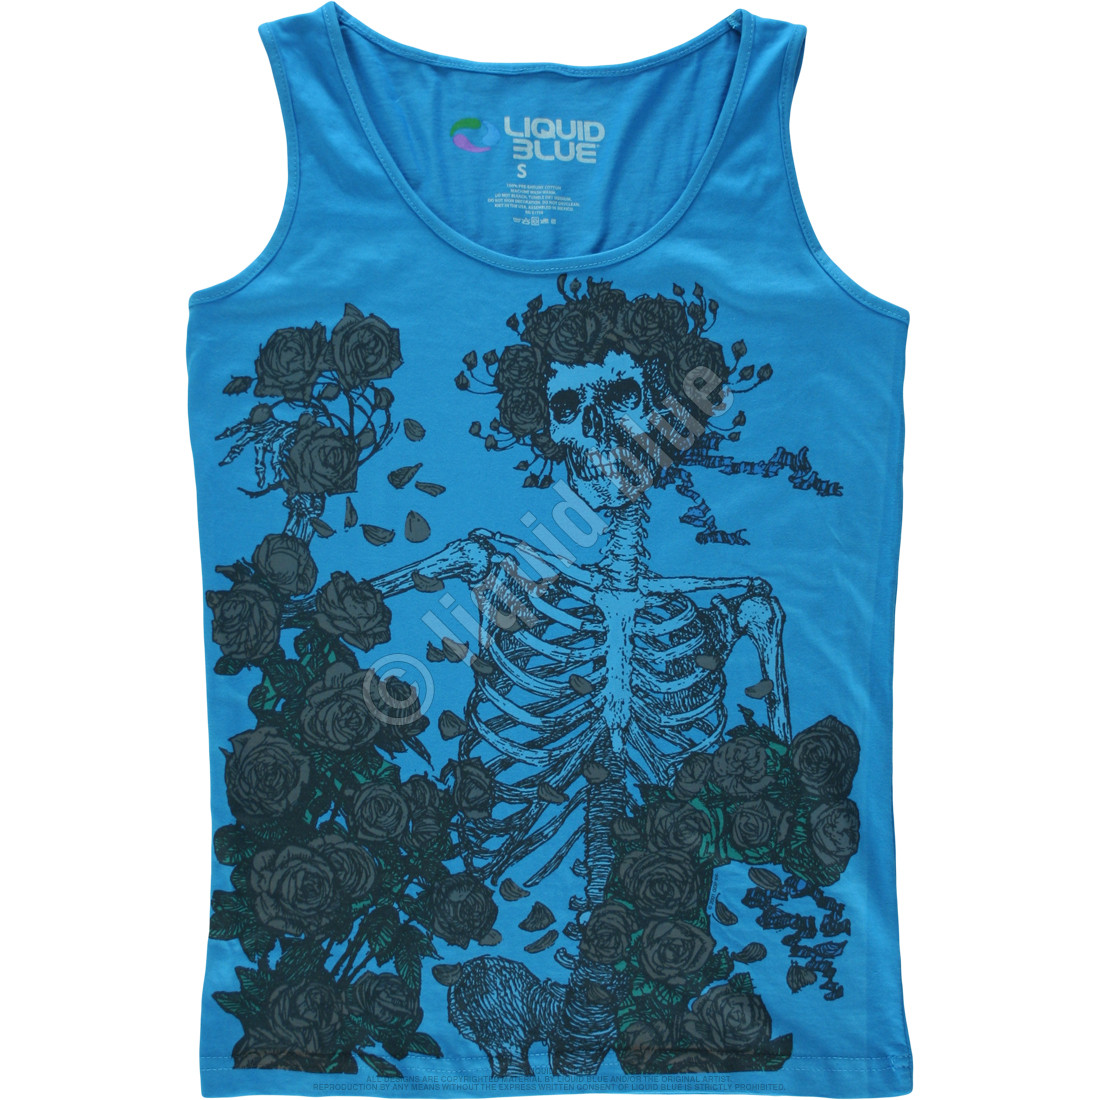 Skeleton and Roses Tie-Dye Juniors Tank Top T-Shirt